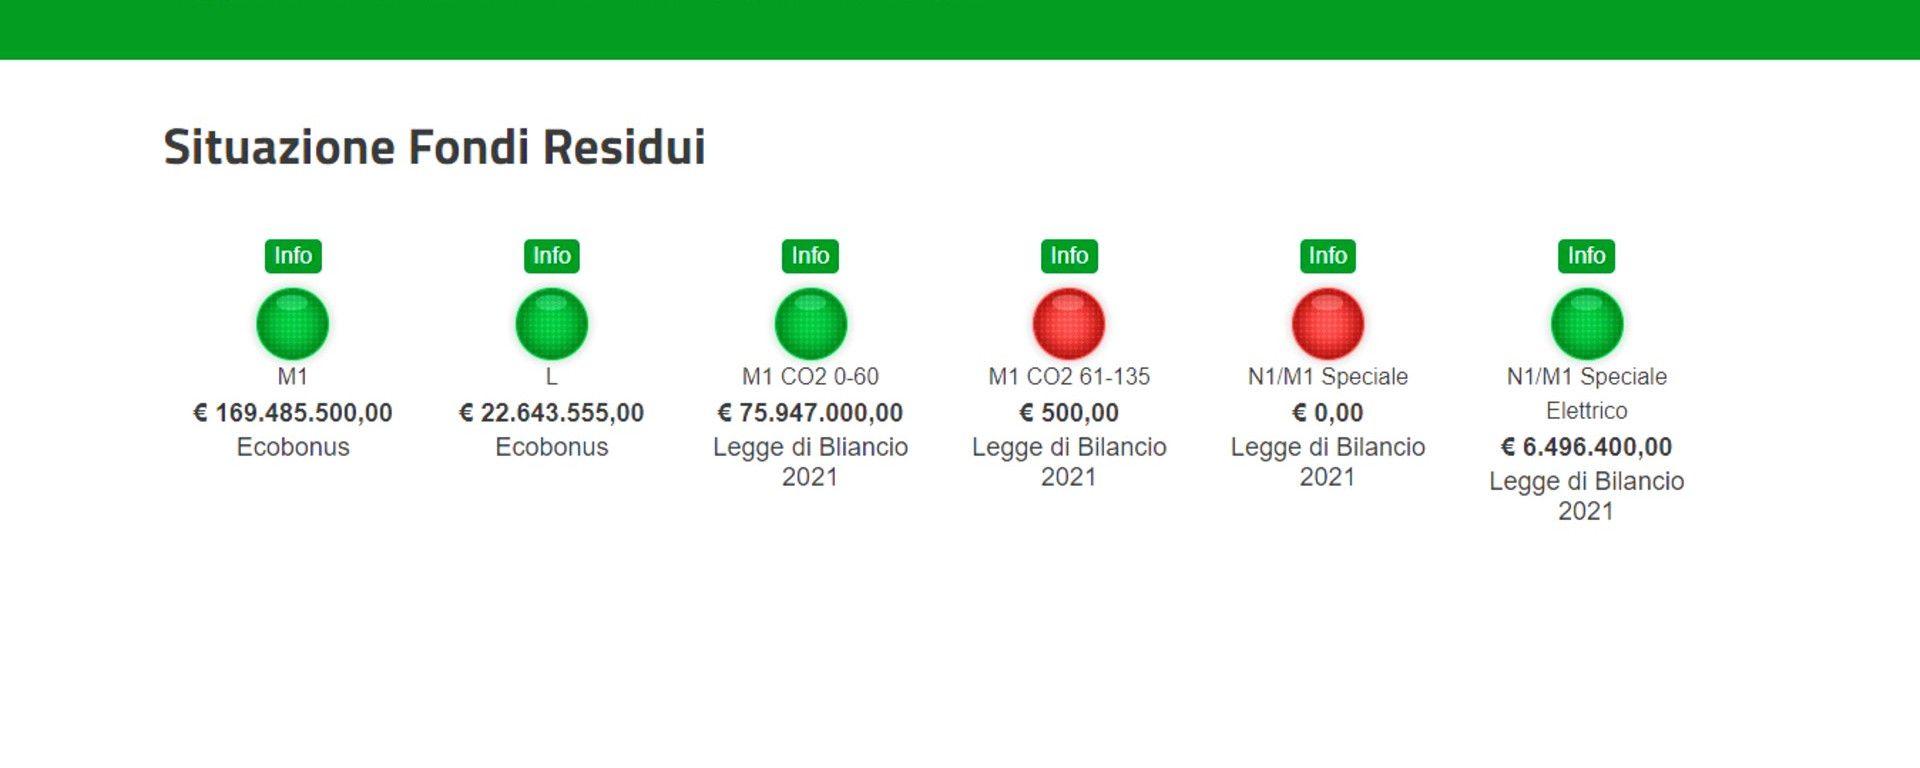 Situazione fondi residui Ecobonus al 9 aprile 2021